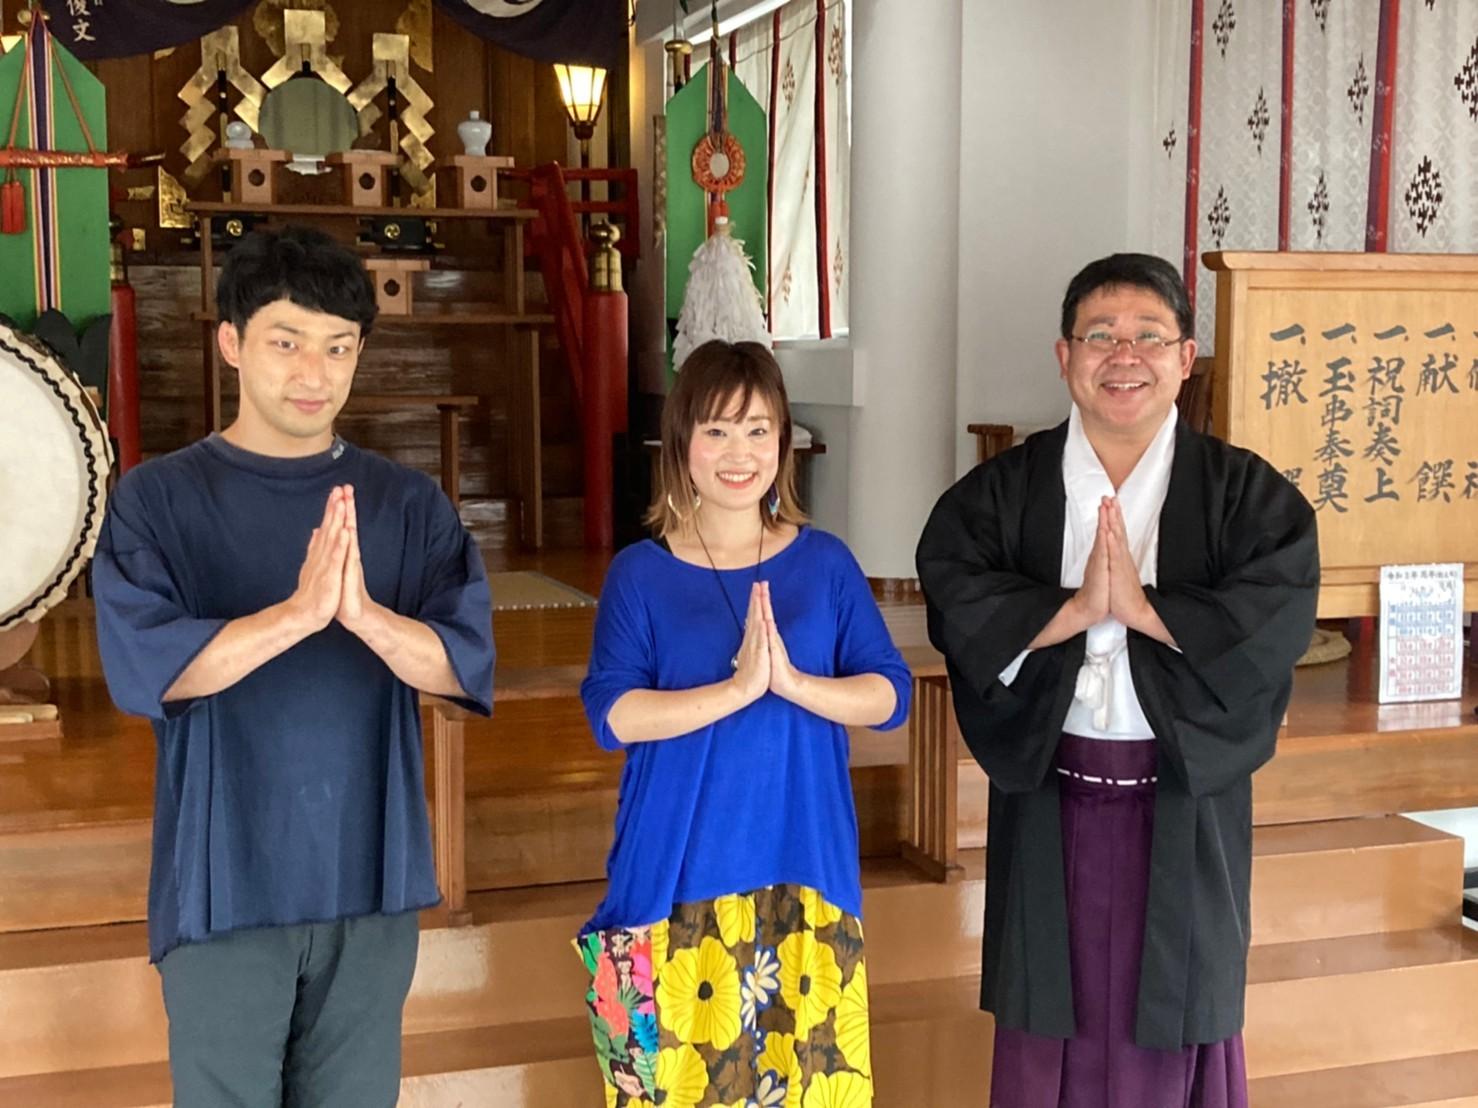 【第1回神社ヨガ開催決定!!】_c0045448_20103179.jpg